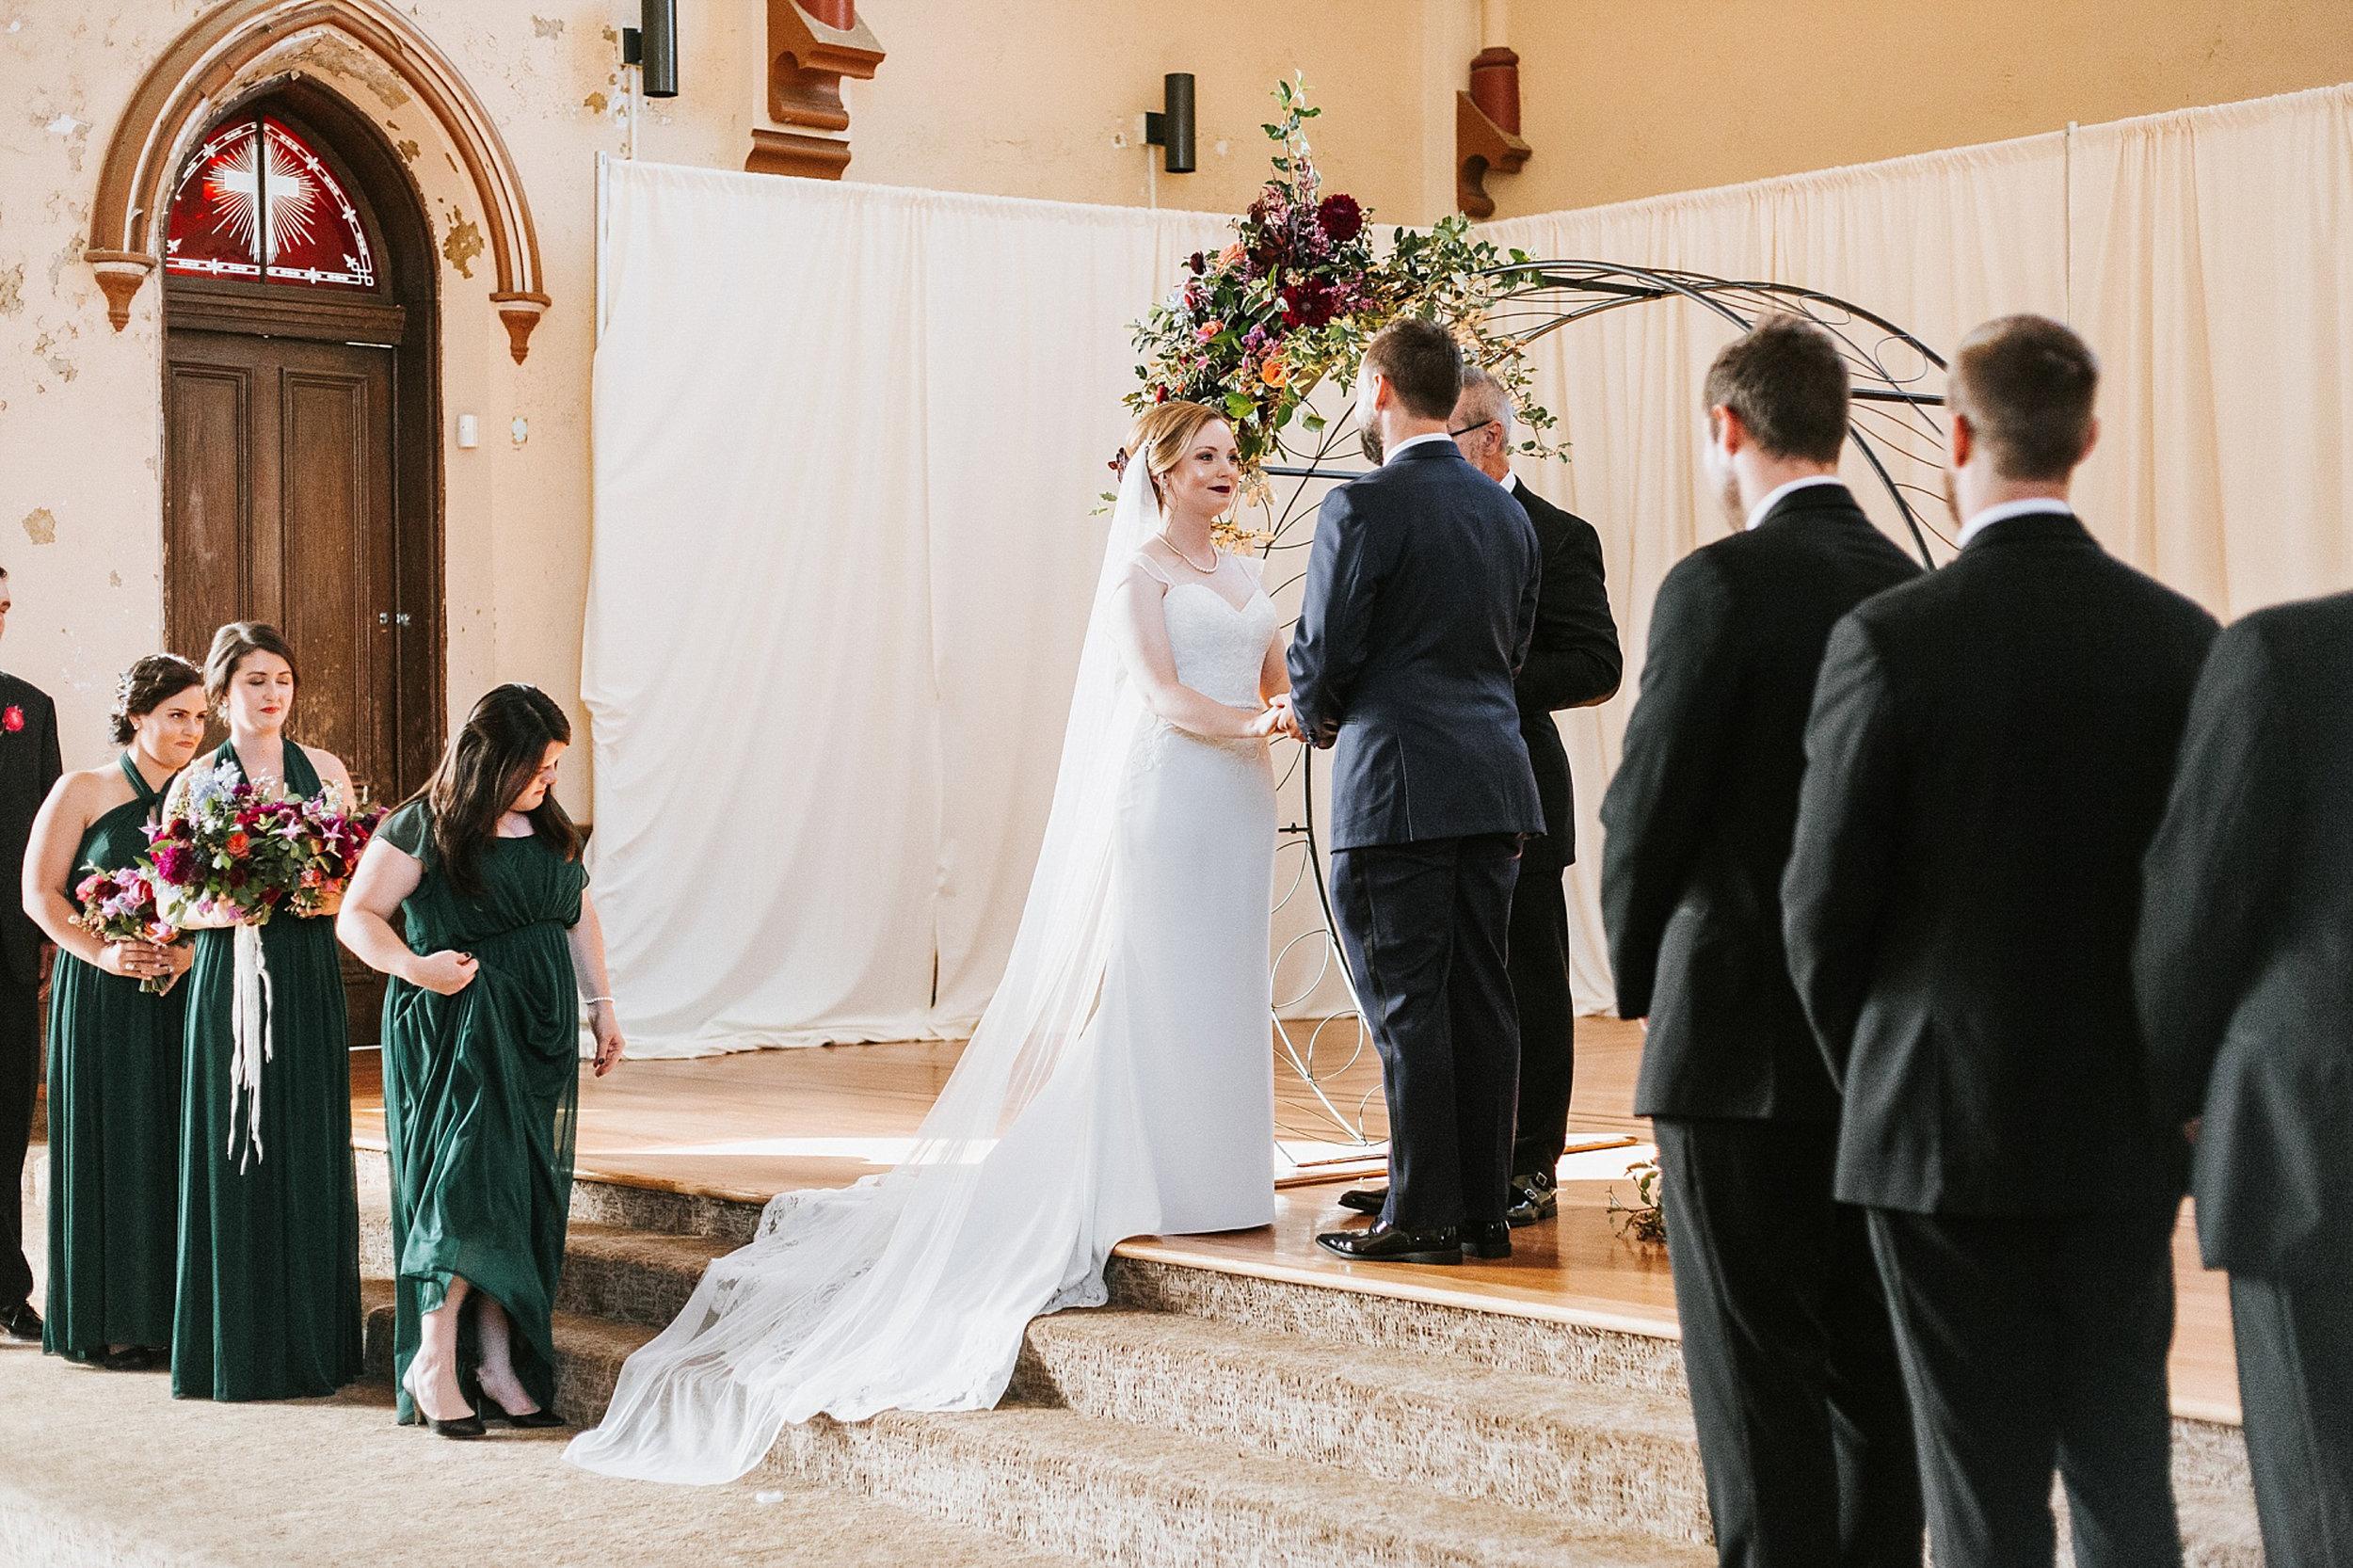 Brooke Townsend Photography - Ohio Wedding Photographer-127.jpg